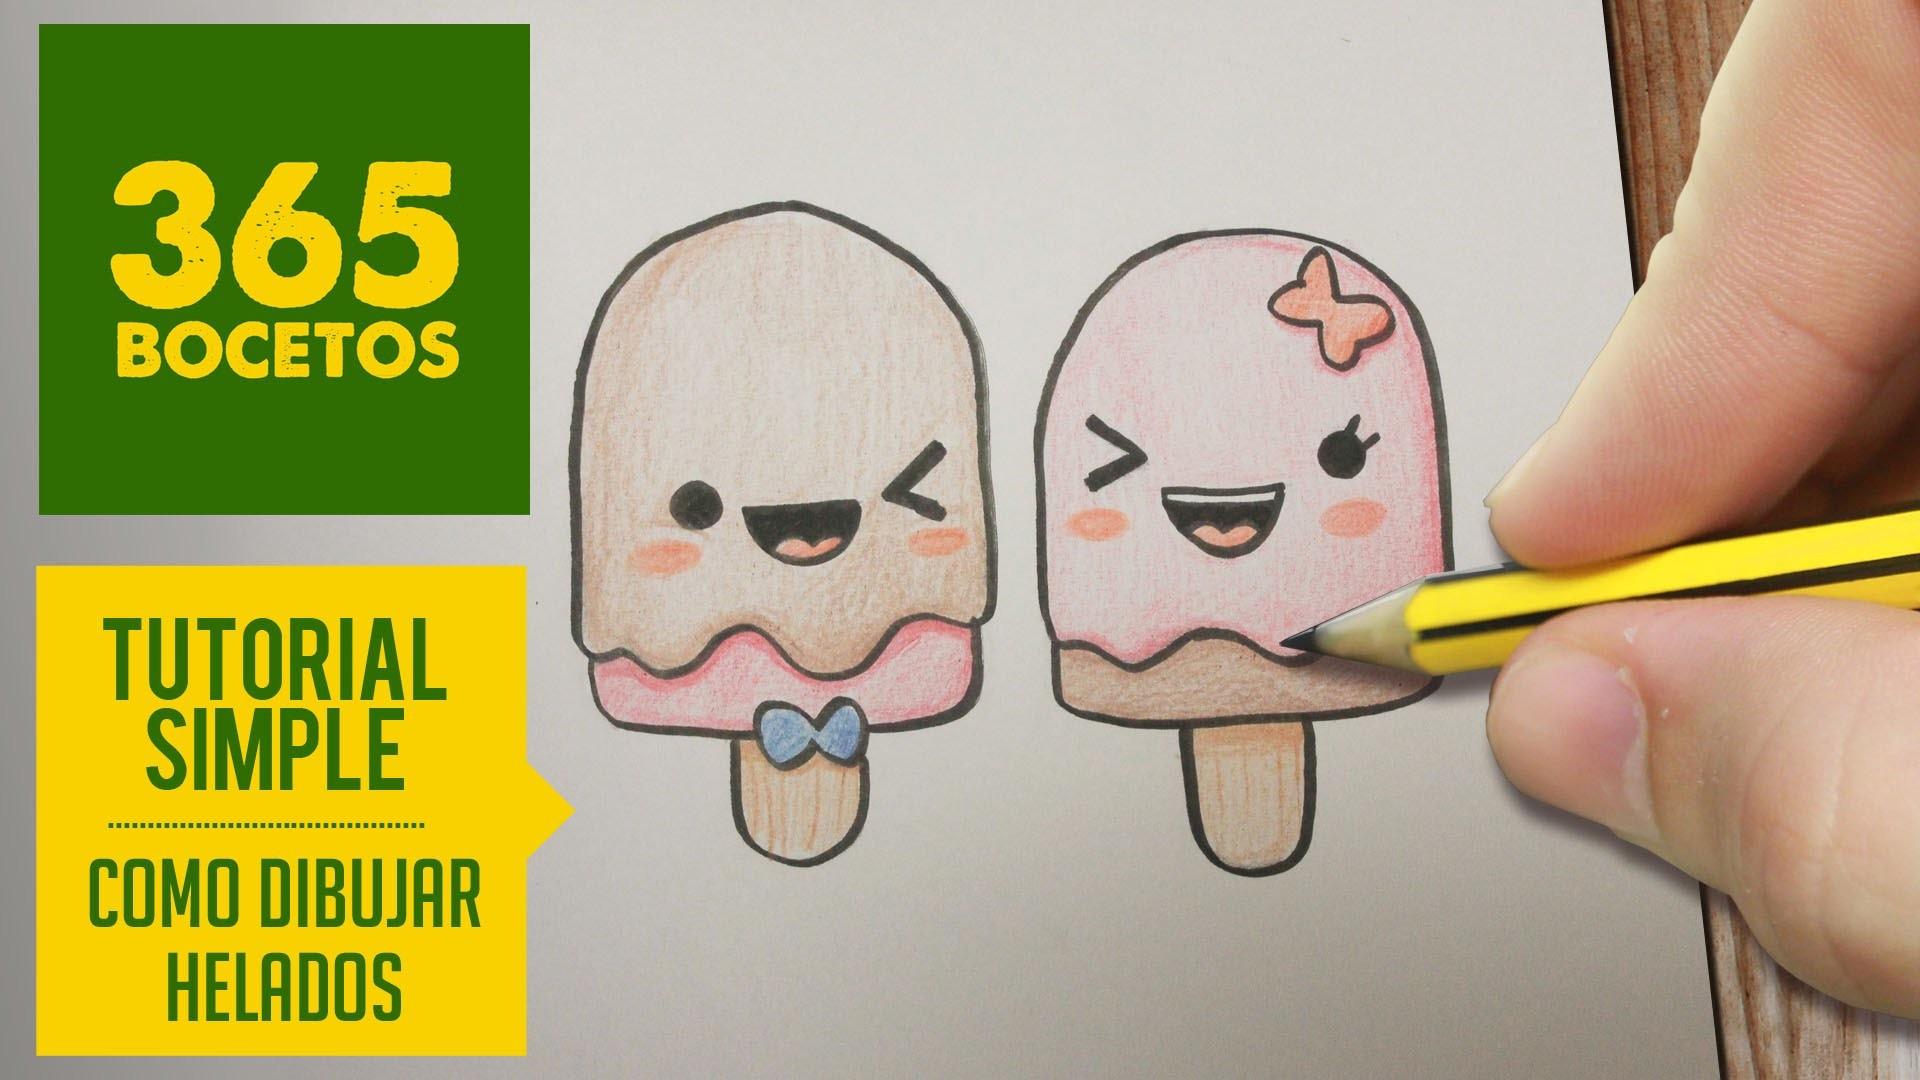 COMO DIBUJAR PALETAS HELADAS KAWAII PASO A PASO - Dibujos kawaii faciles - How to draw an Ice Cream